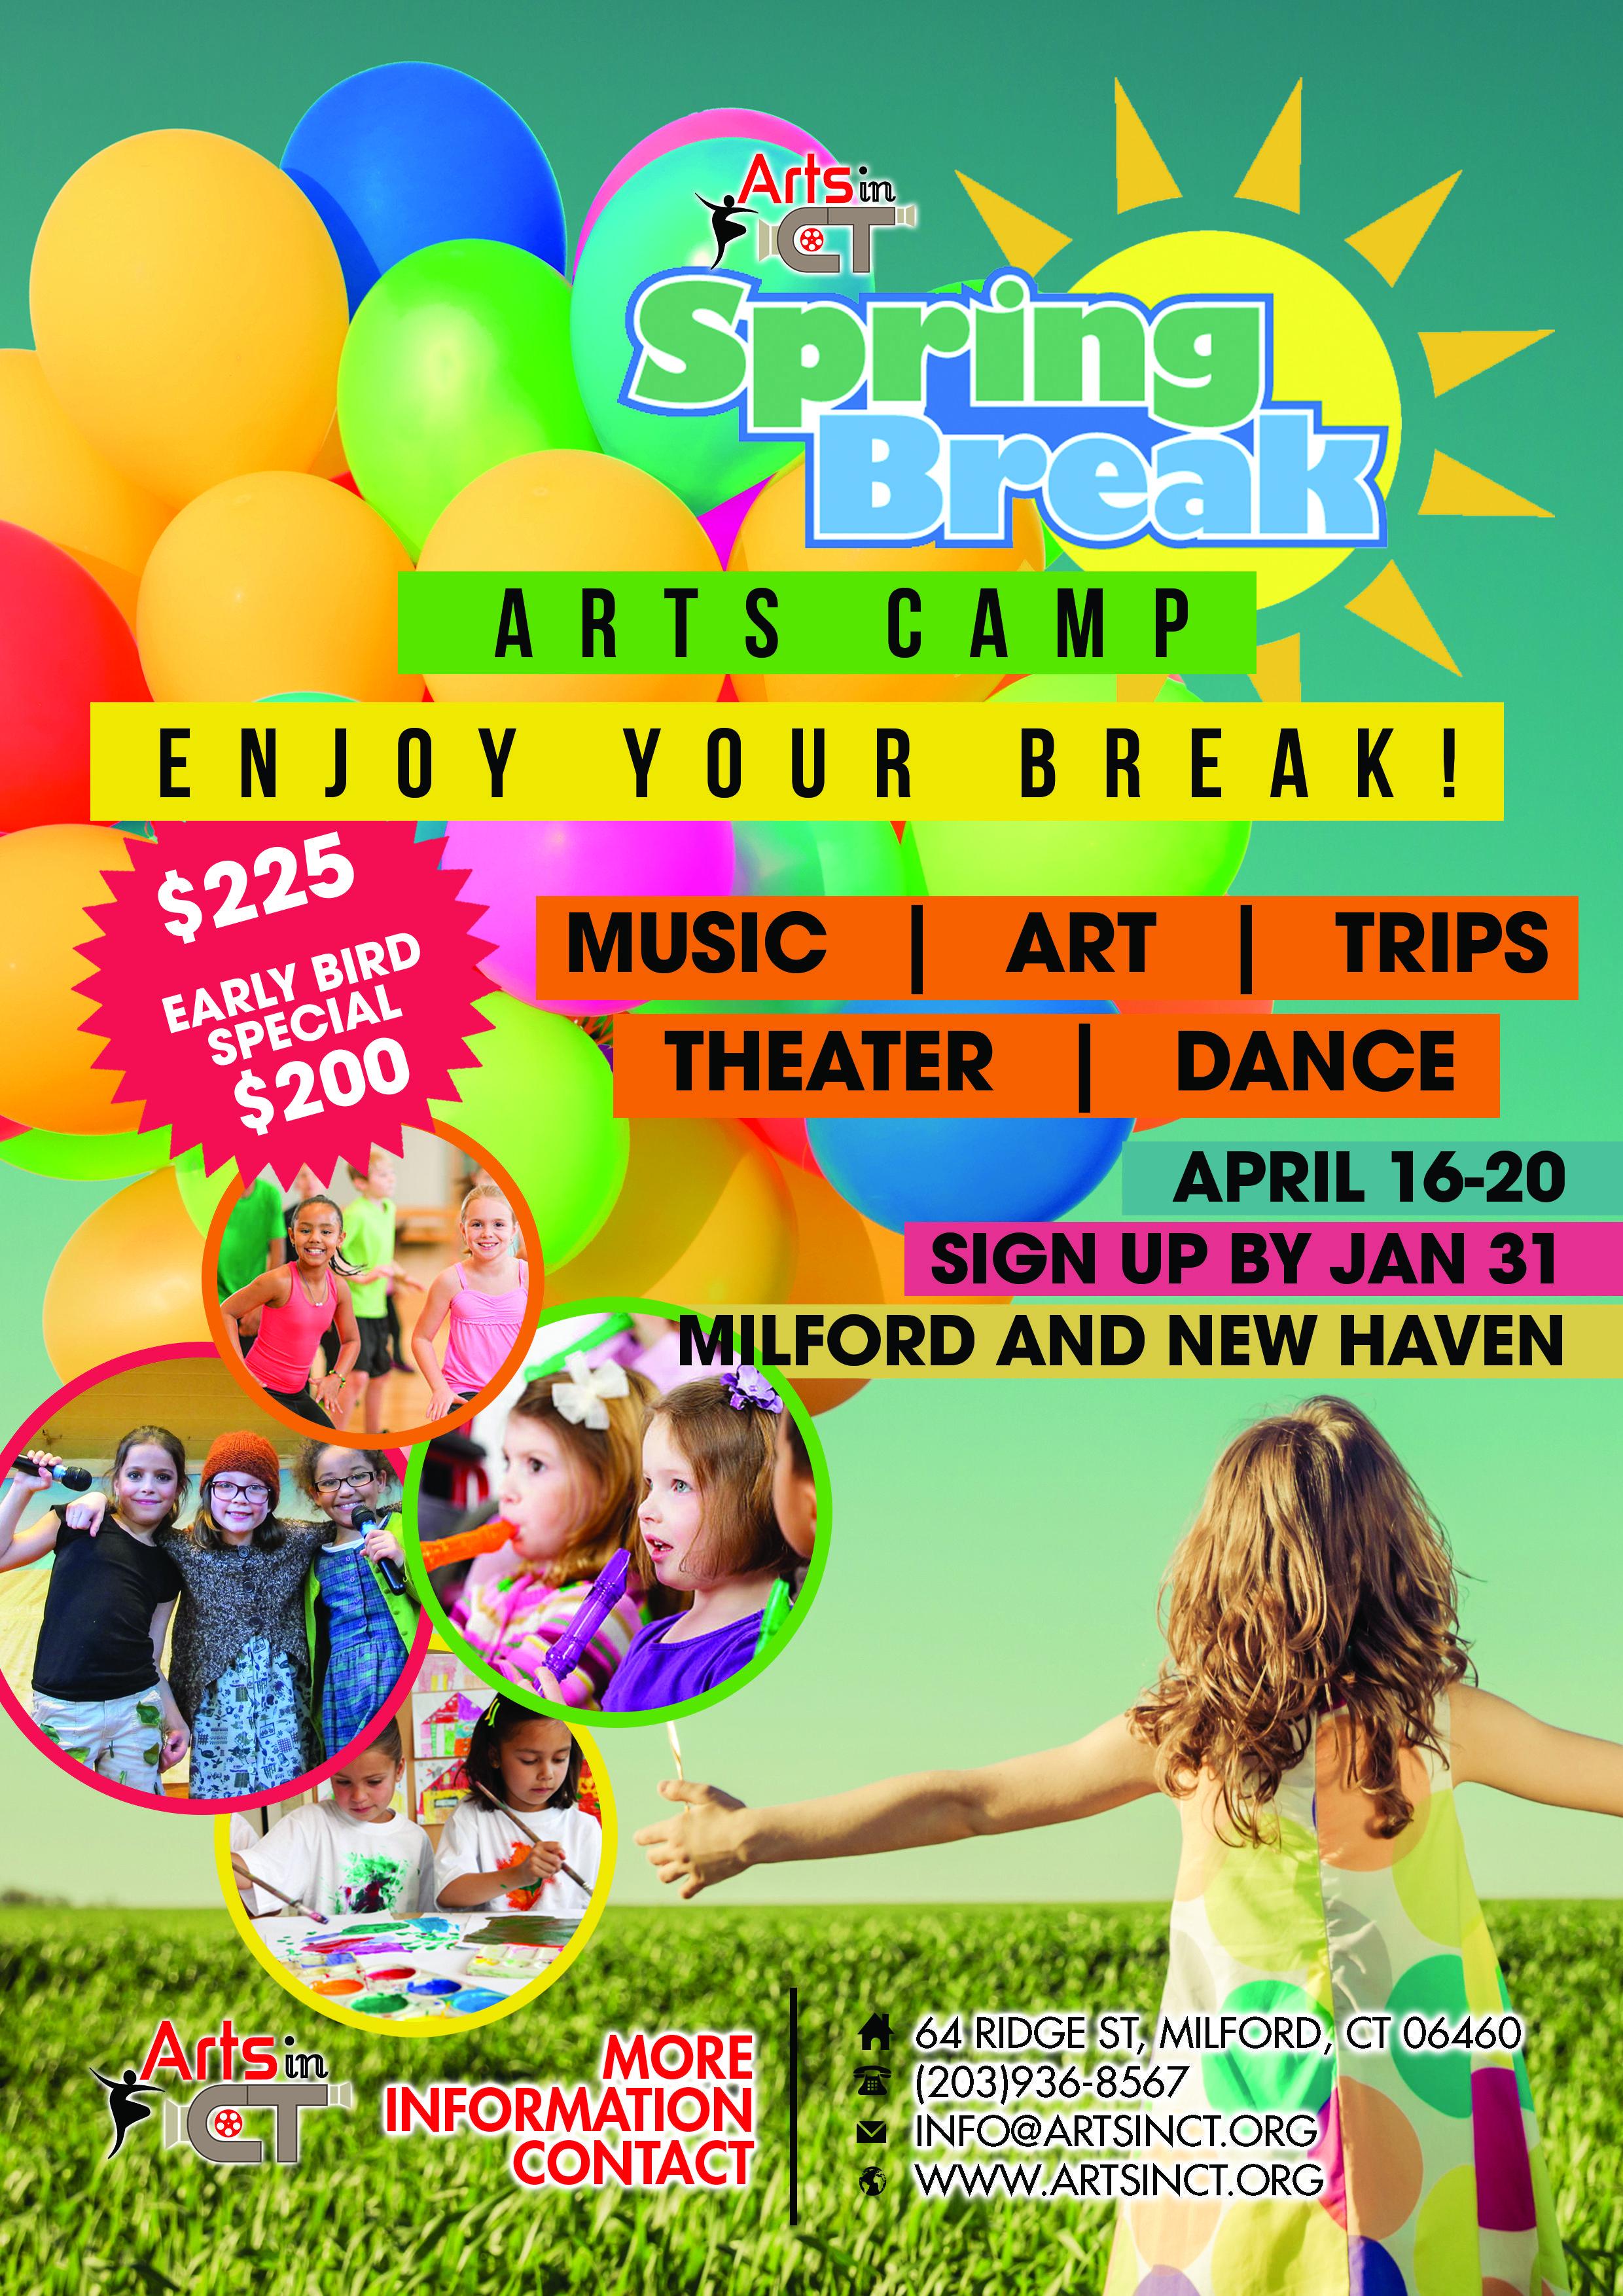 Spring Break Arts Camp